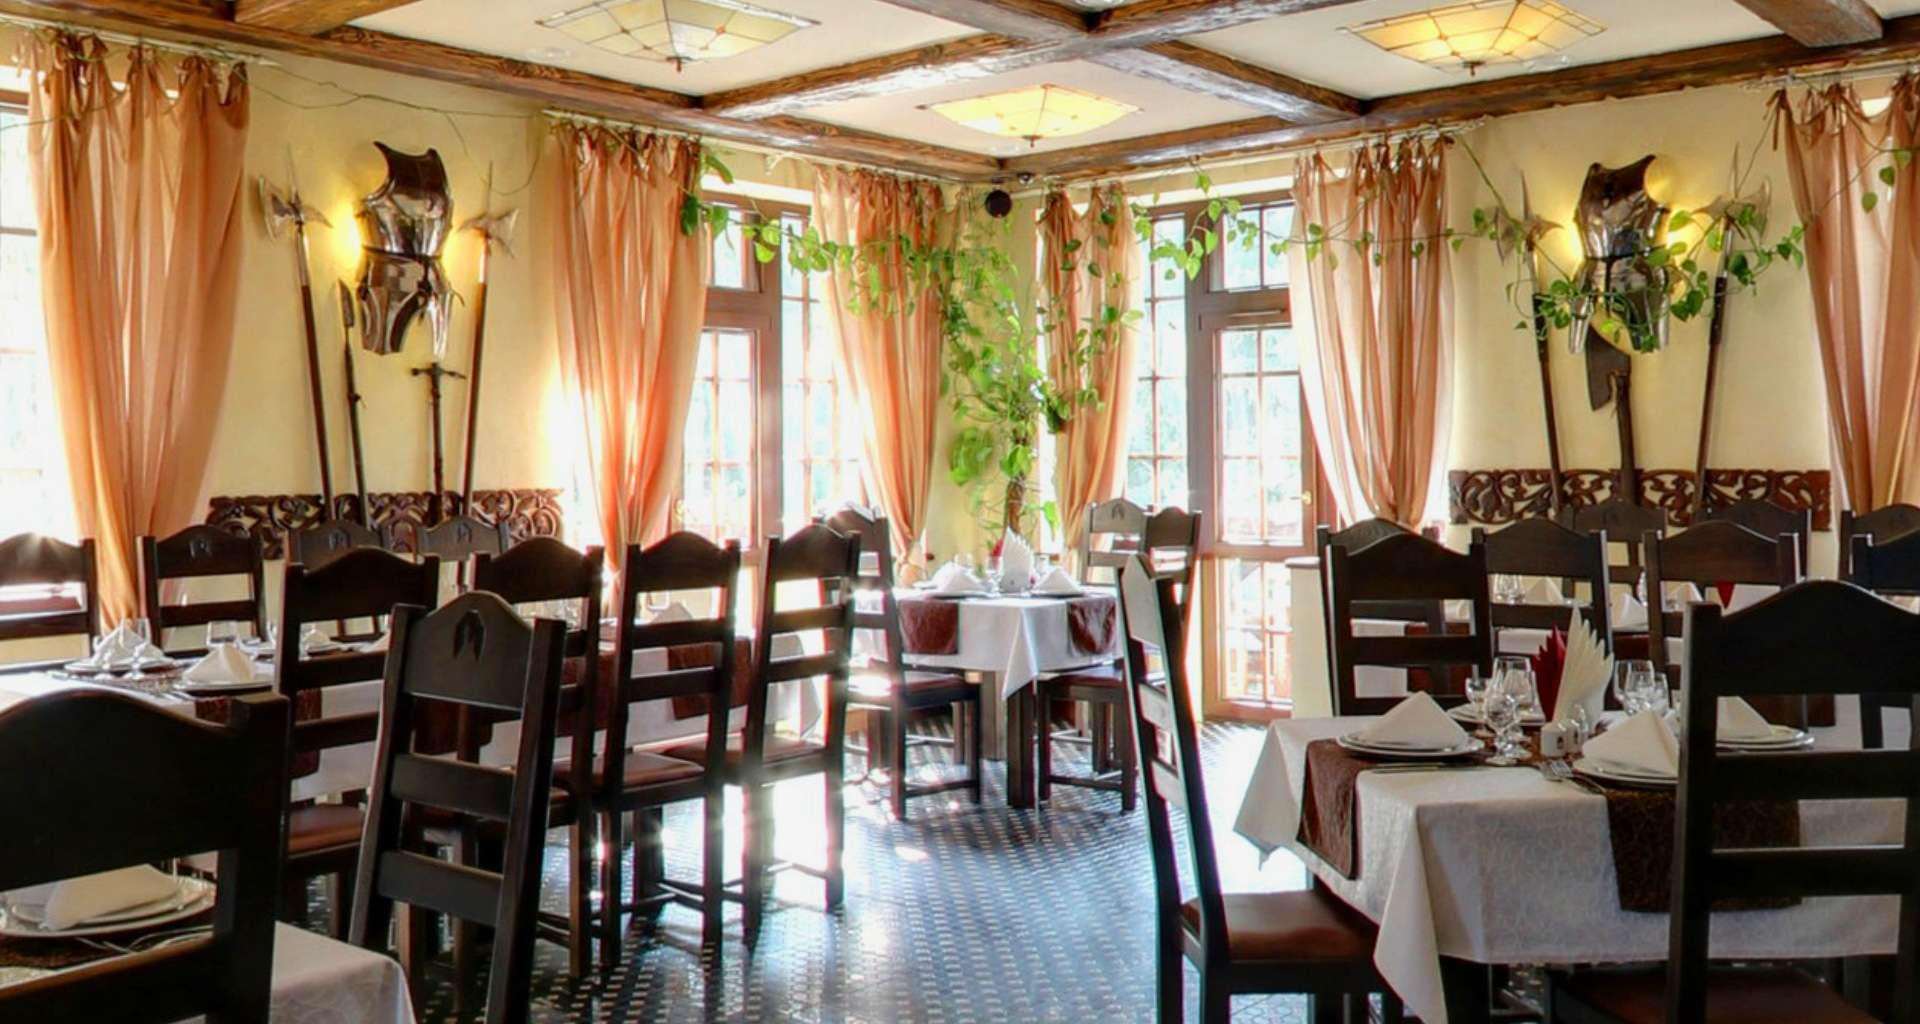 Trapezna Restaurant in the Carpathians